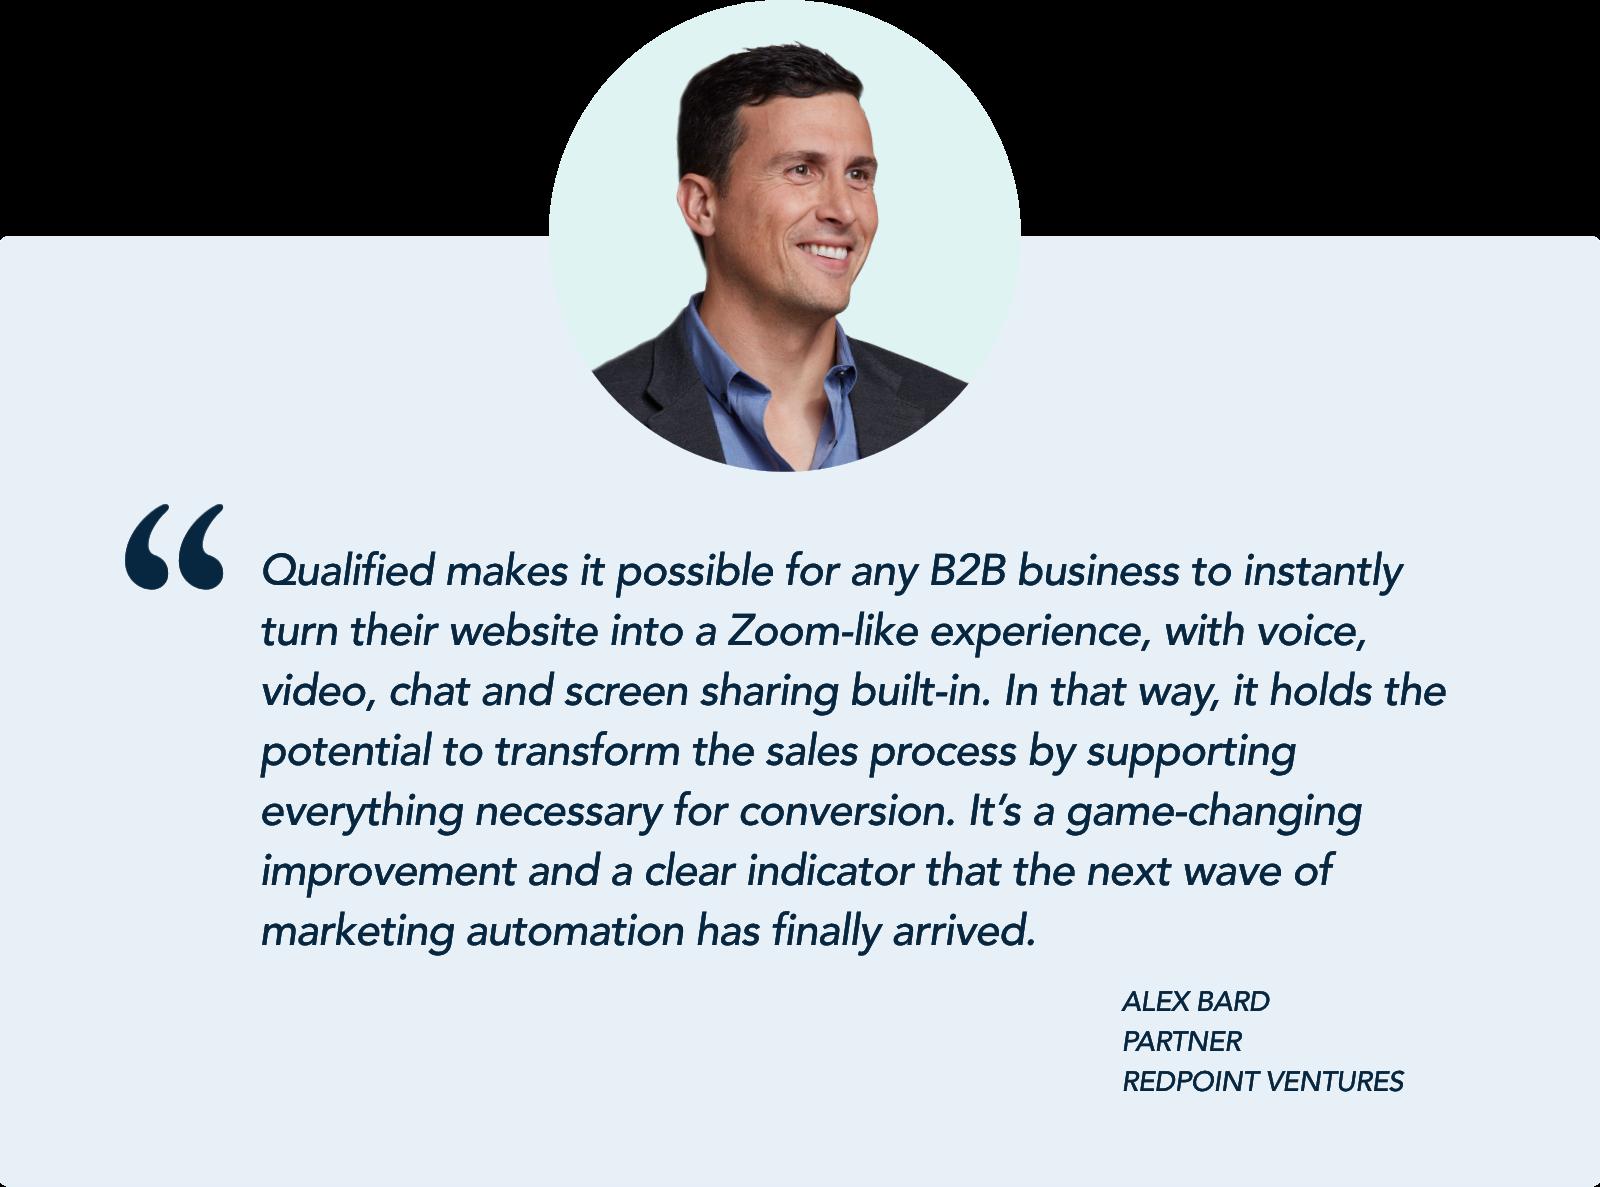 Alex Bard, Partner, Redpoint Ventures